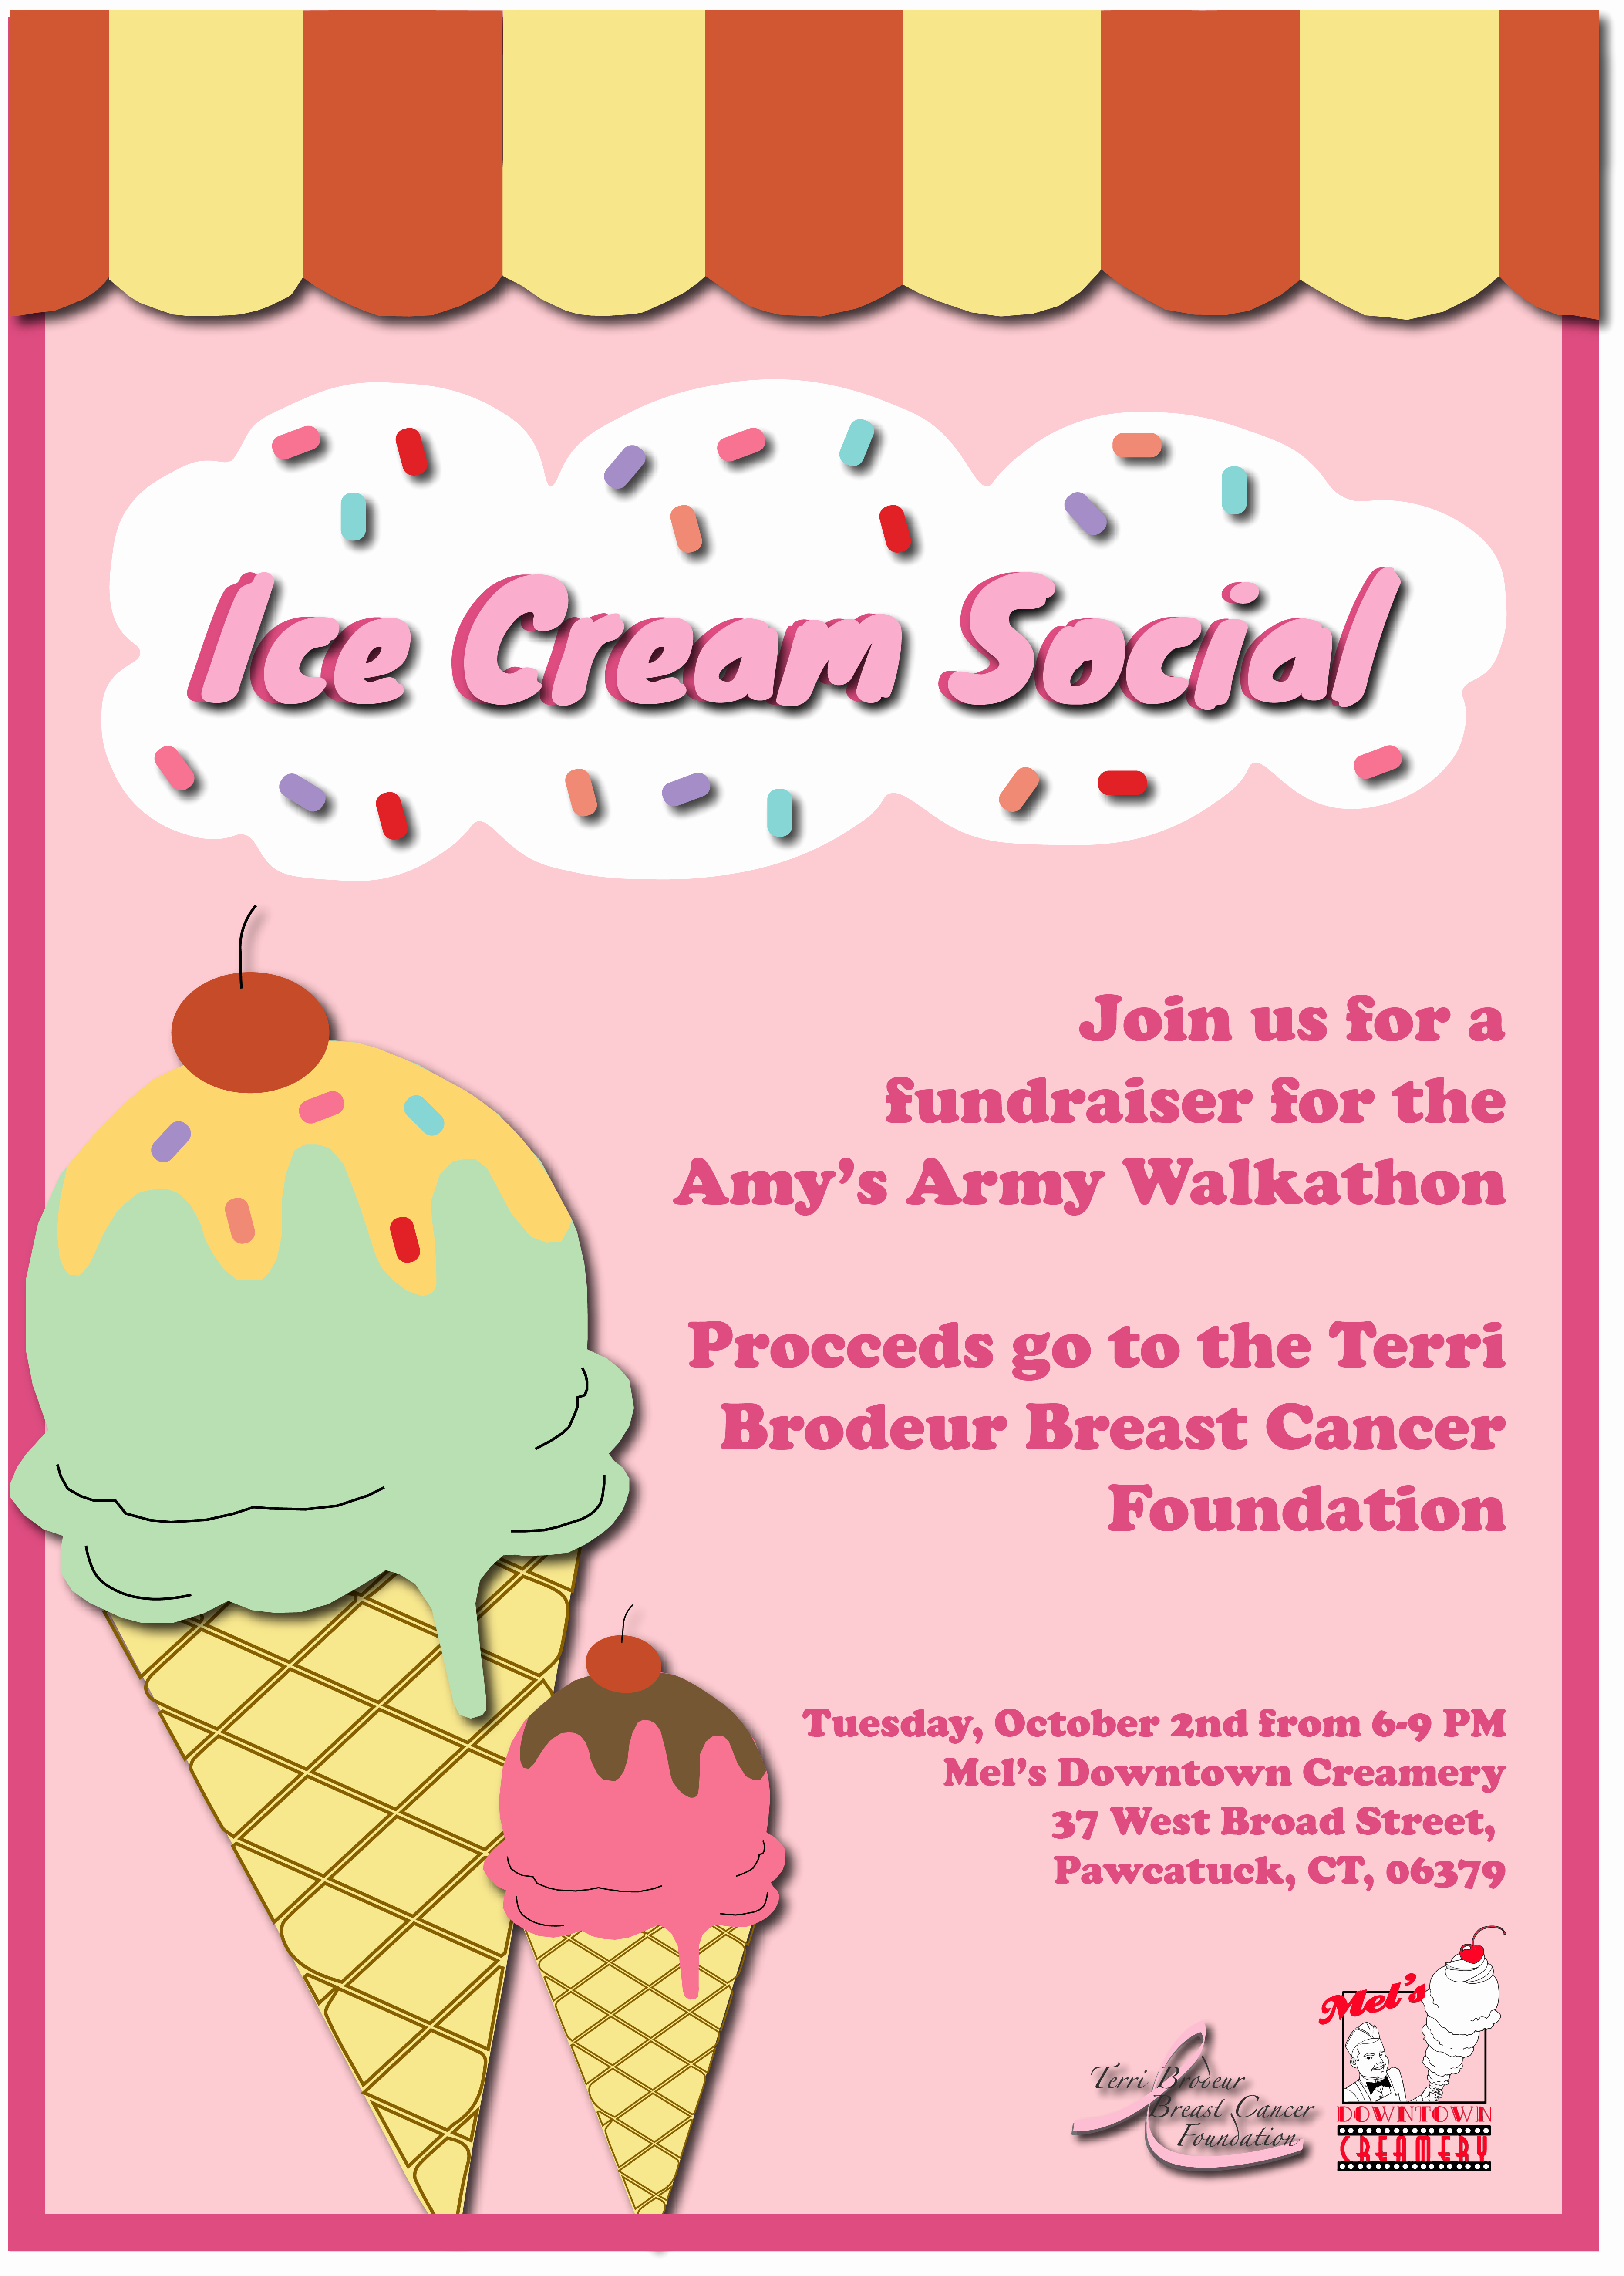 Ice Cream social Flyer Fresh Ice Cream social Flyer Terri Brodeur Breast Cancer